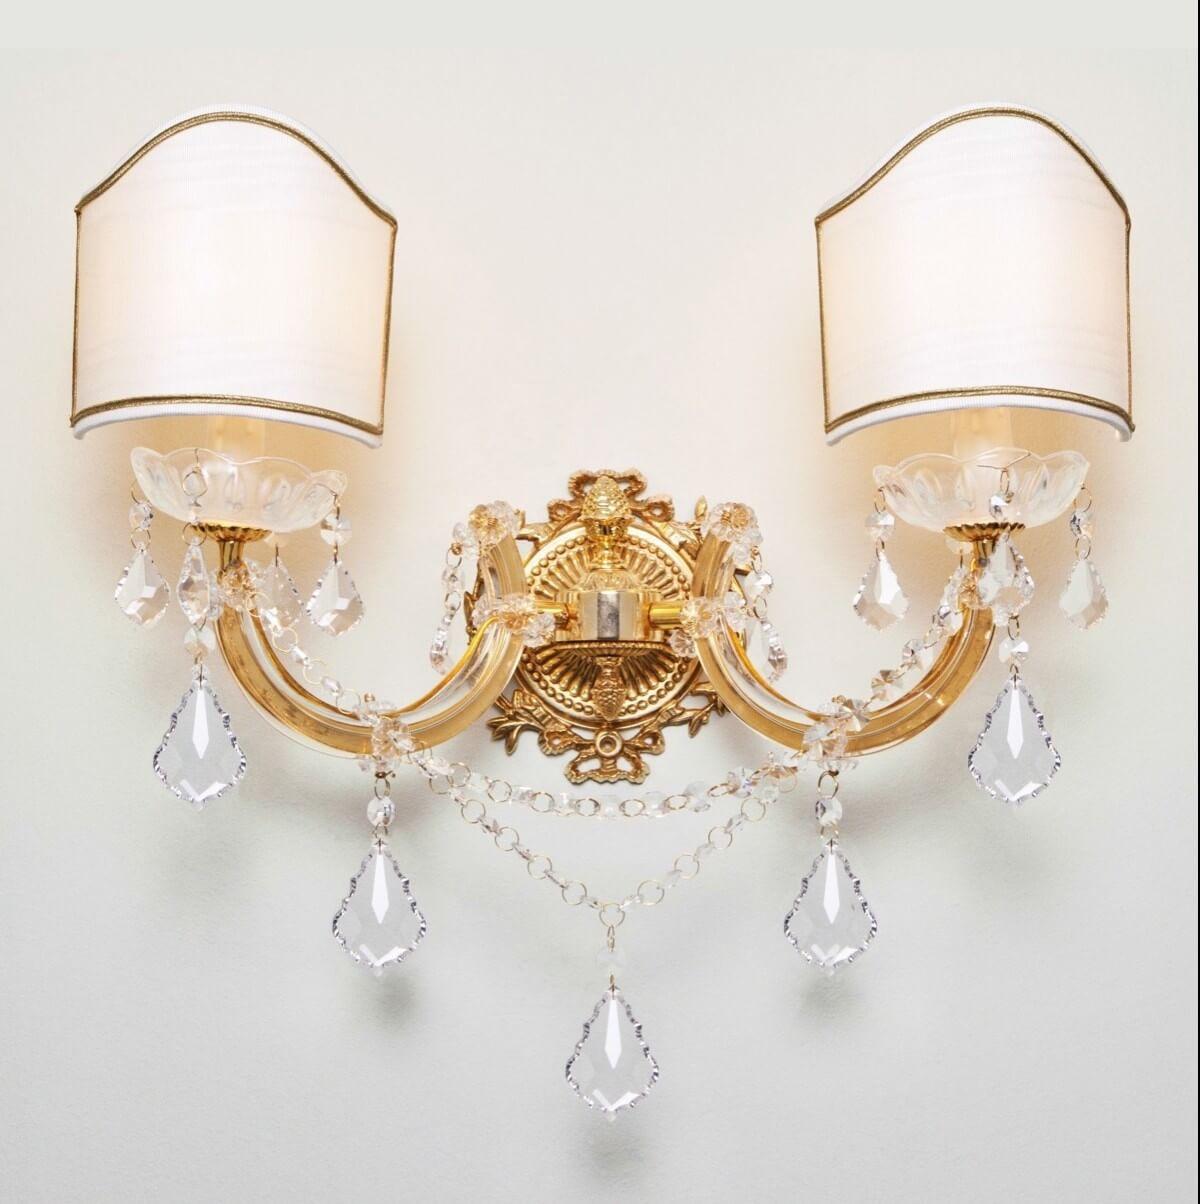 wandlampe ragna 2 flammig ph nix sch ner leben. Black Bedroom Furniture Sets. Home Design Ideas